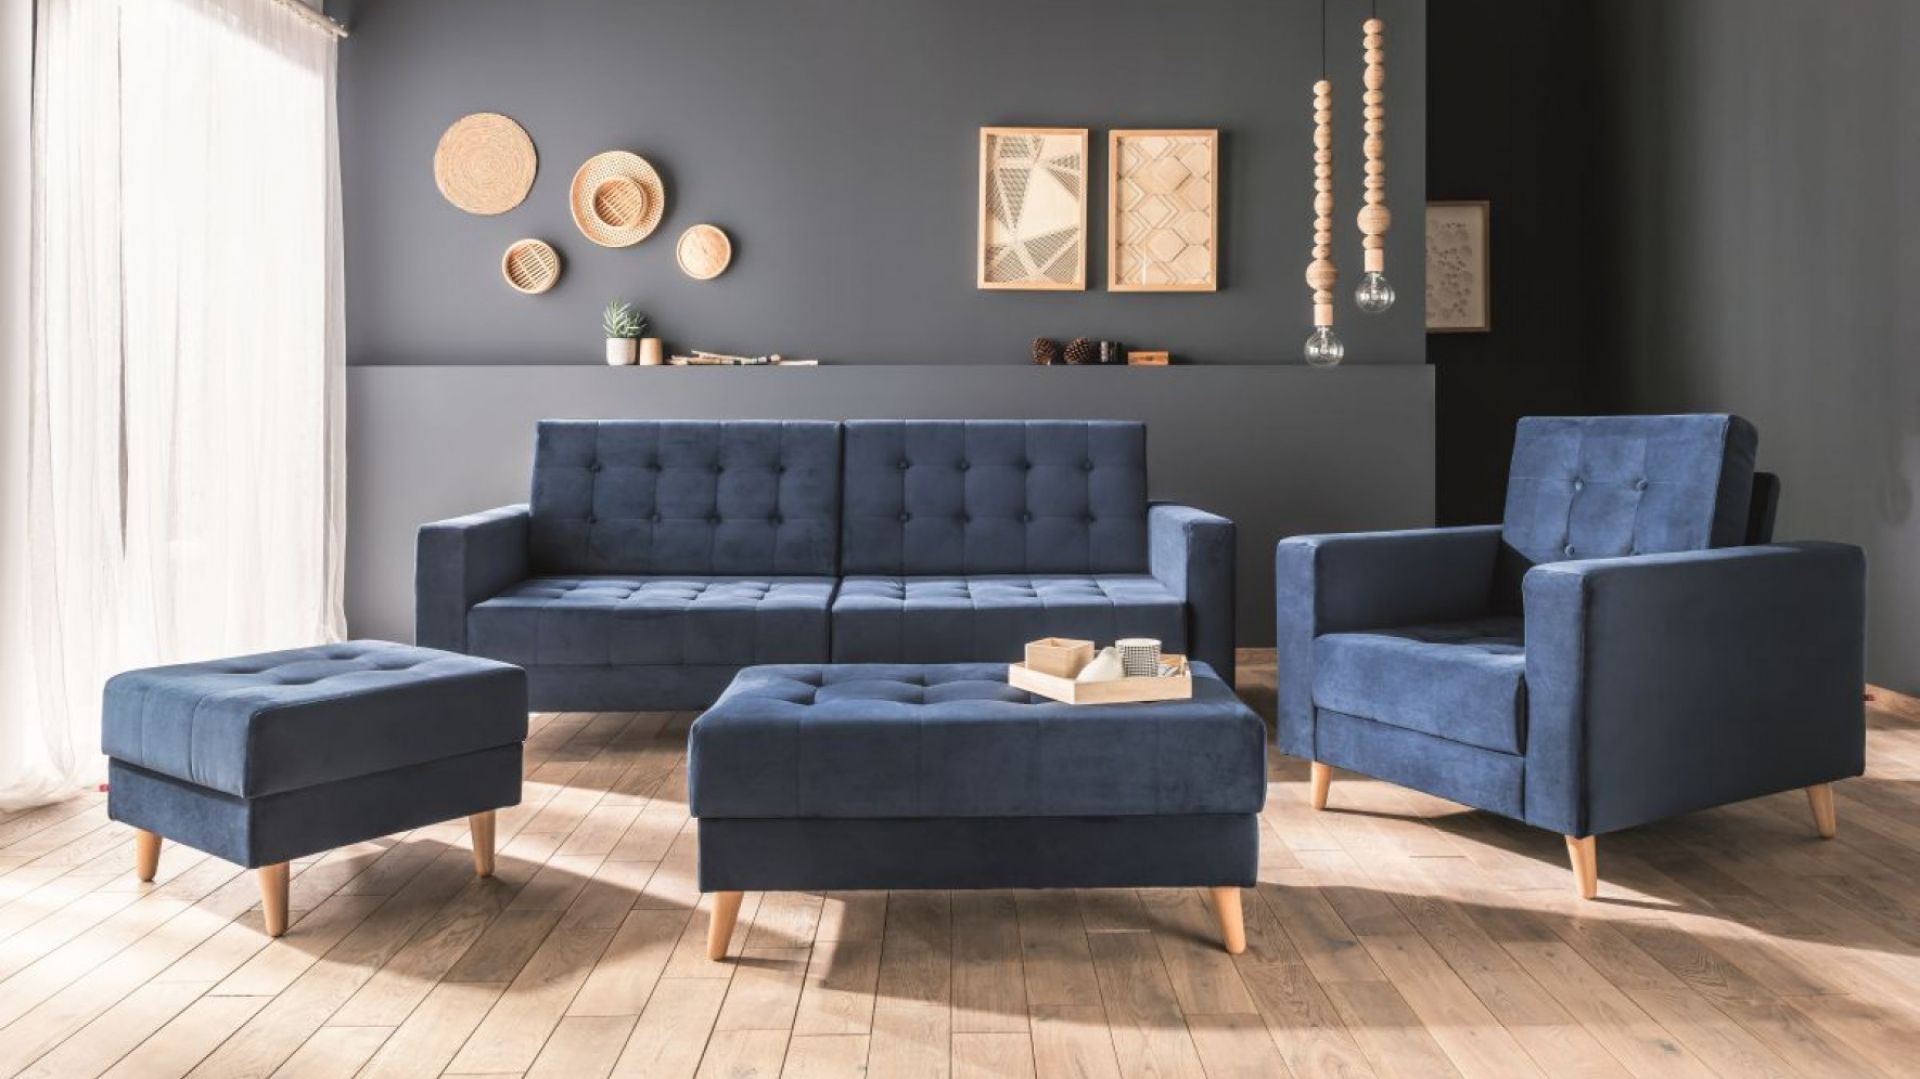 Sofa Piqu firmy Vox. Fot. Vox